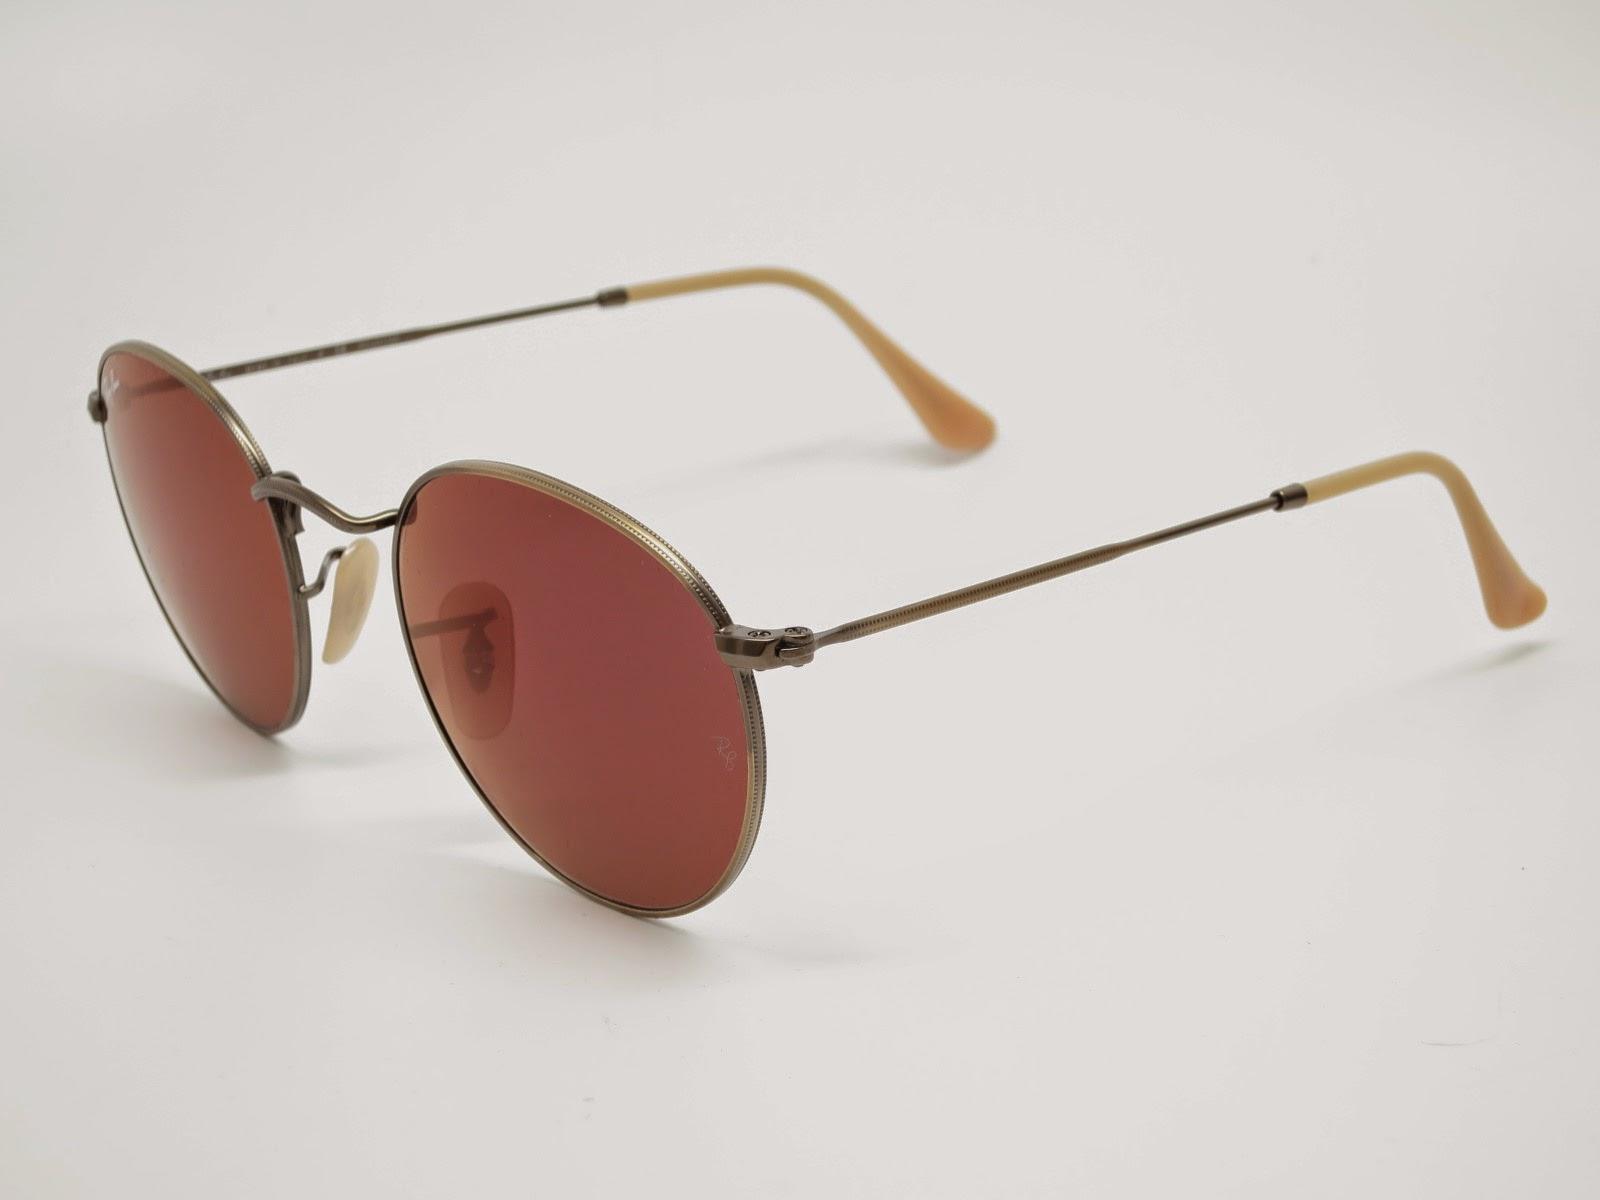 round metal ray band sunglasses heritage malta. Black Bedroom Furniture Sets. Home Design Ideas